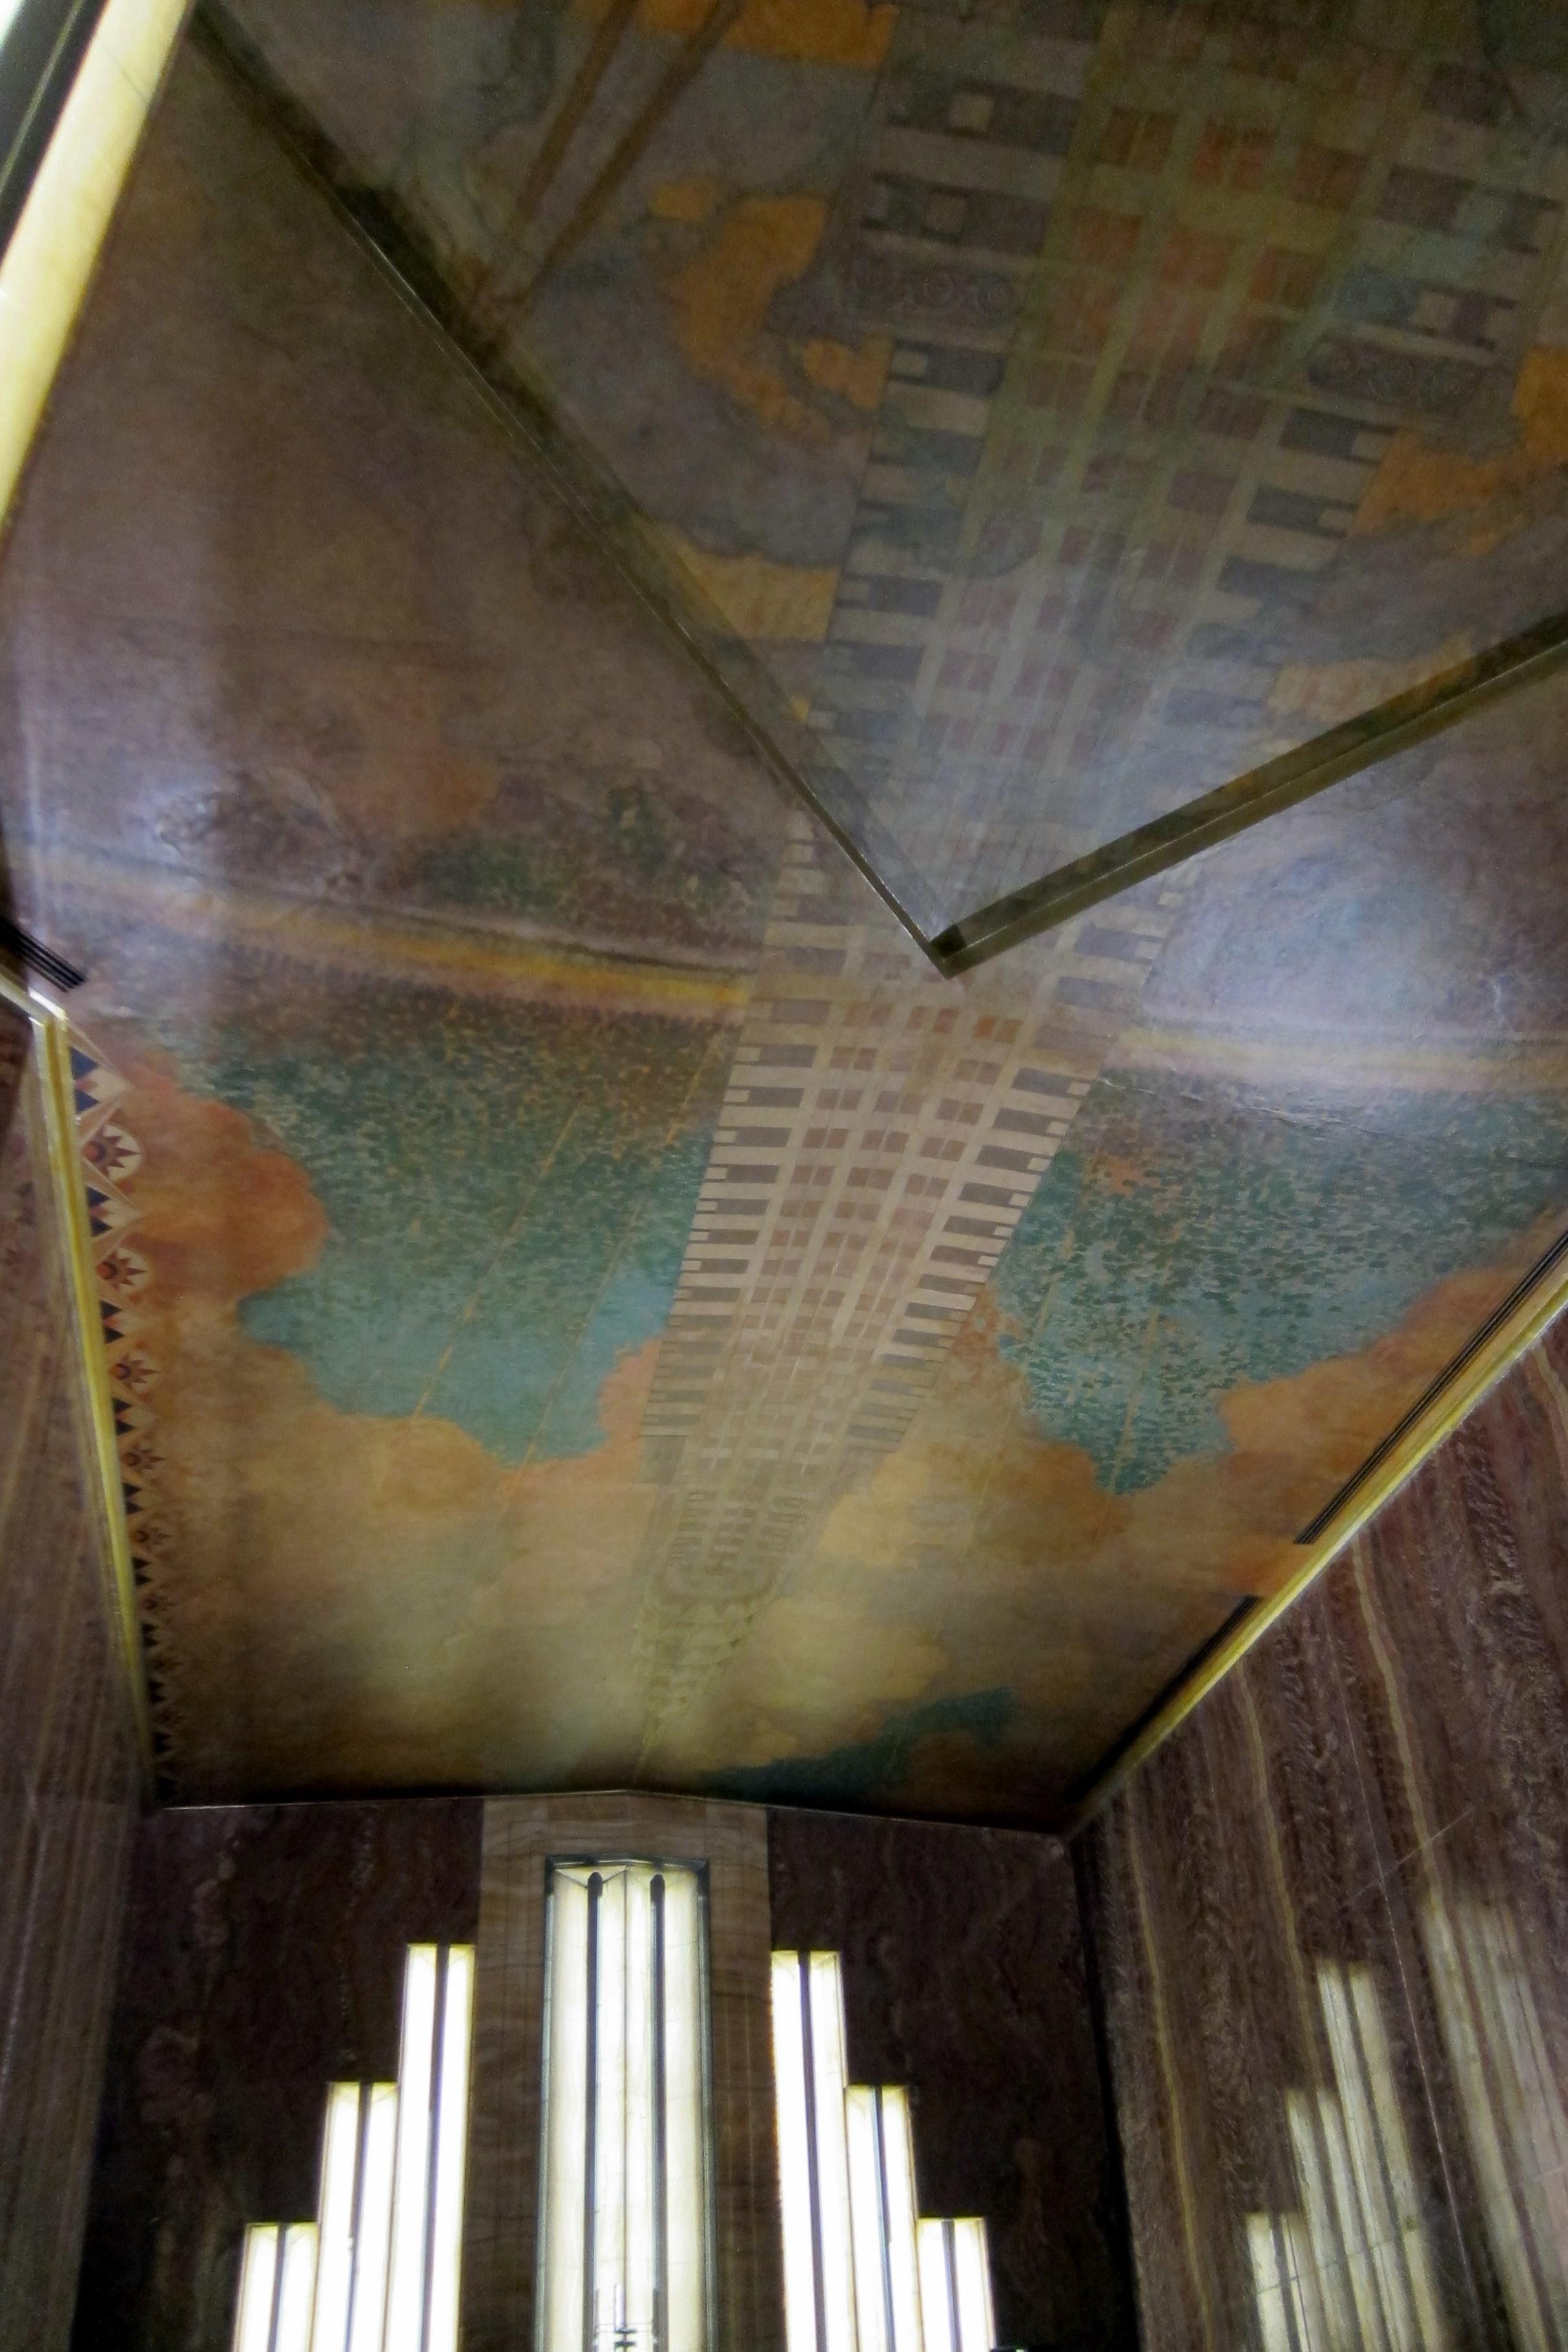 Nyc midtown chrysler building ceiling mural flickr for Chrysler building wall mural